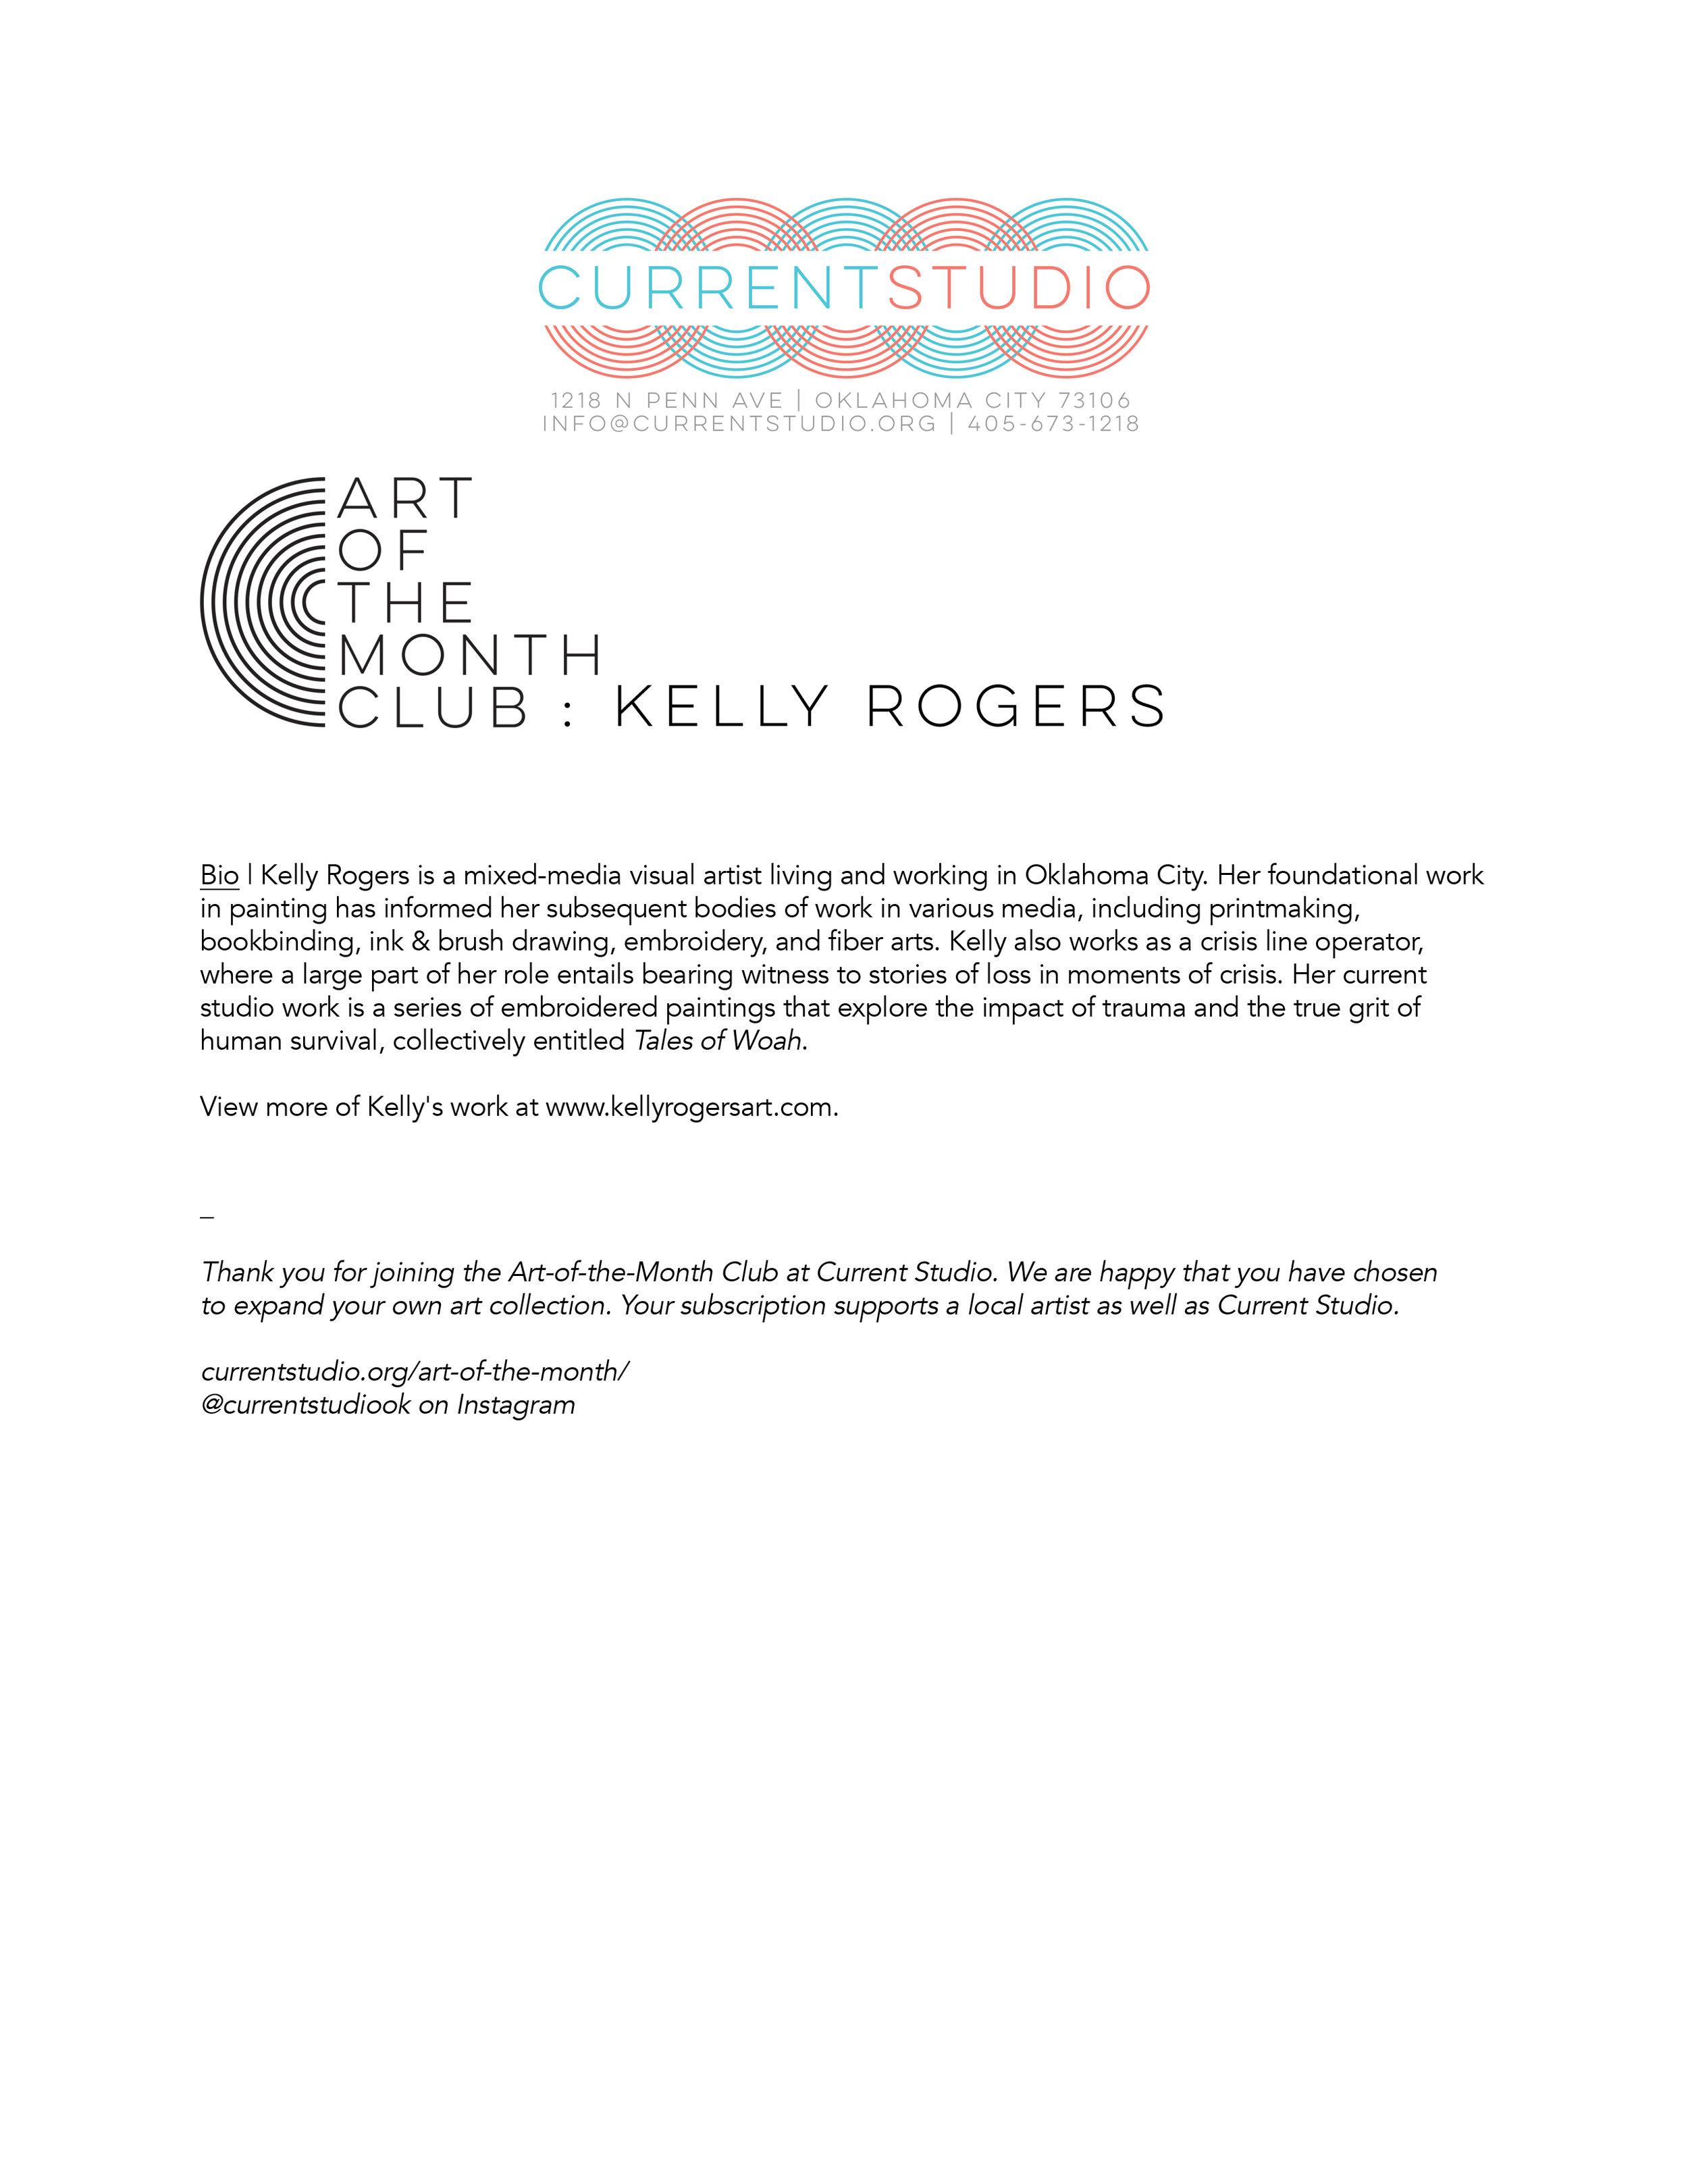 art of the month artist sheet - kelly rogers.jpg